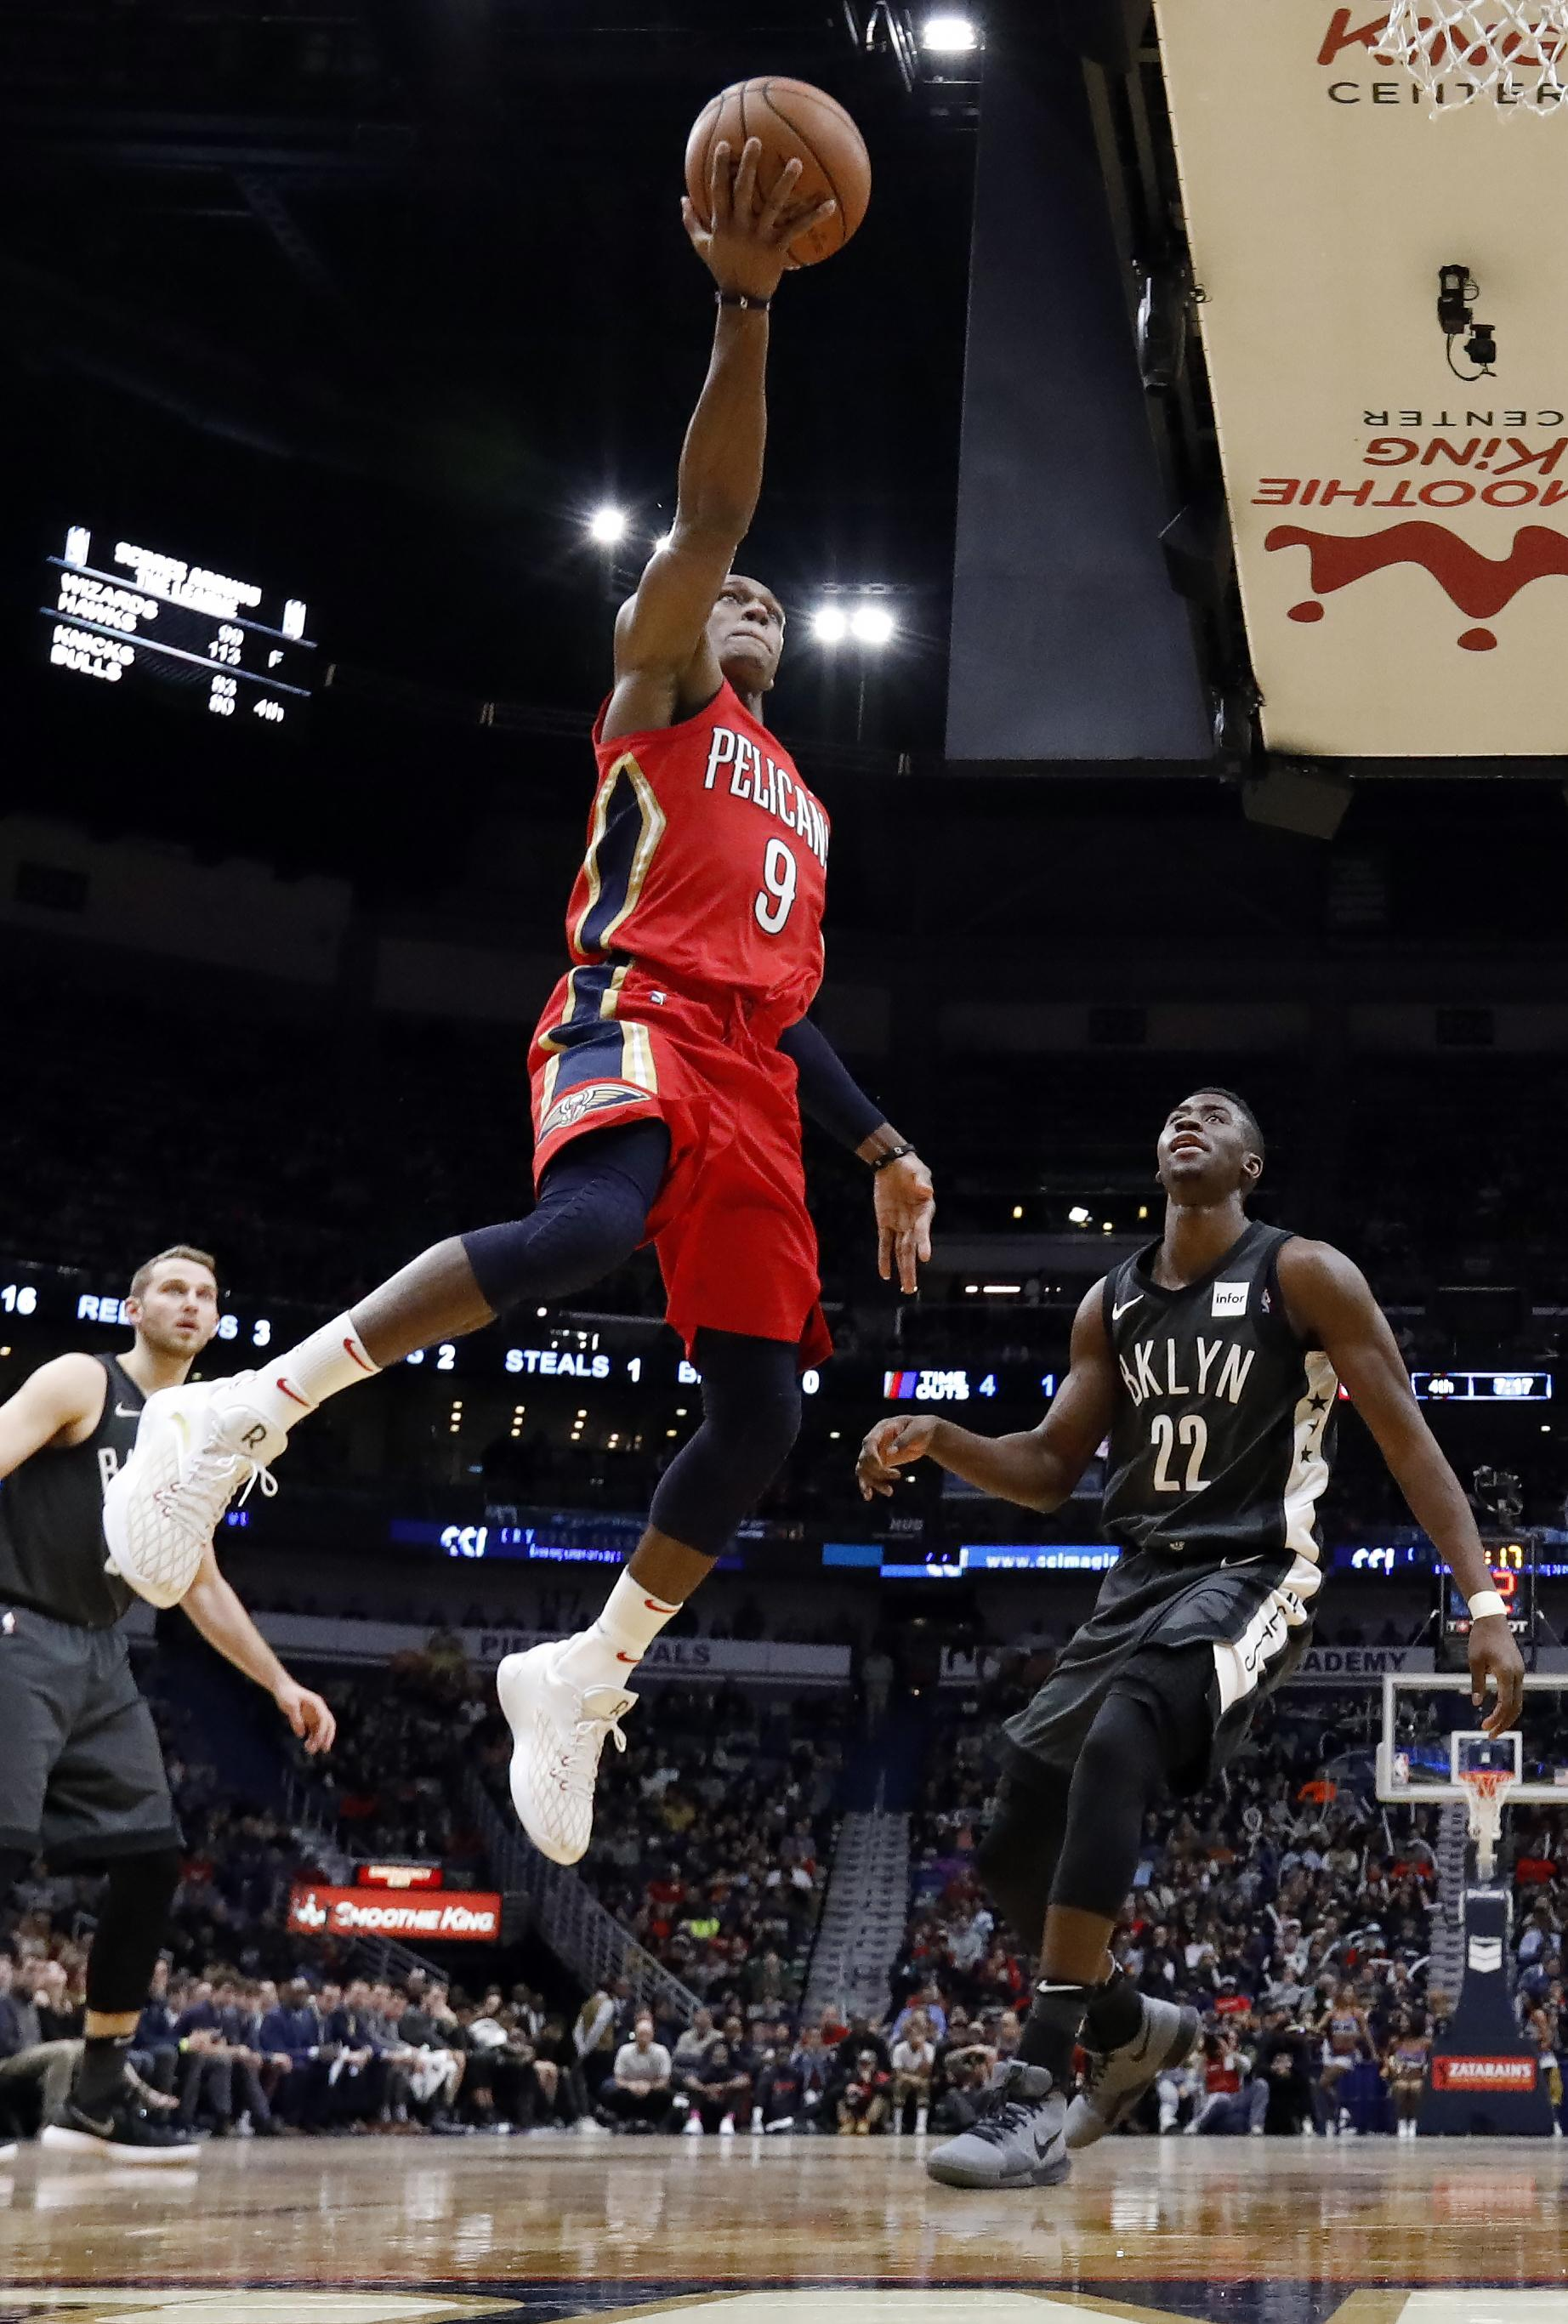 a529deeca New Orleans Pelicans guard Rajon Rondo (9) shoots over Brooklyn Nets guard  Caris LeVert